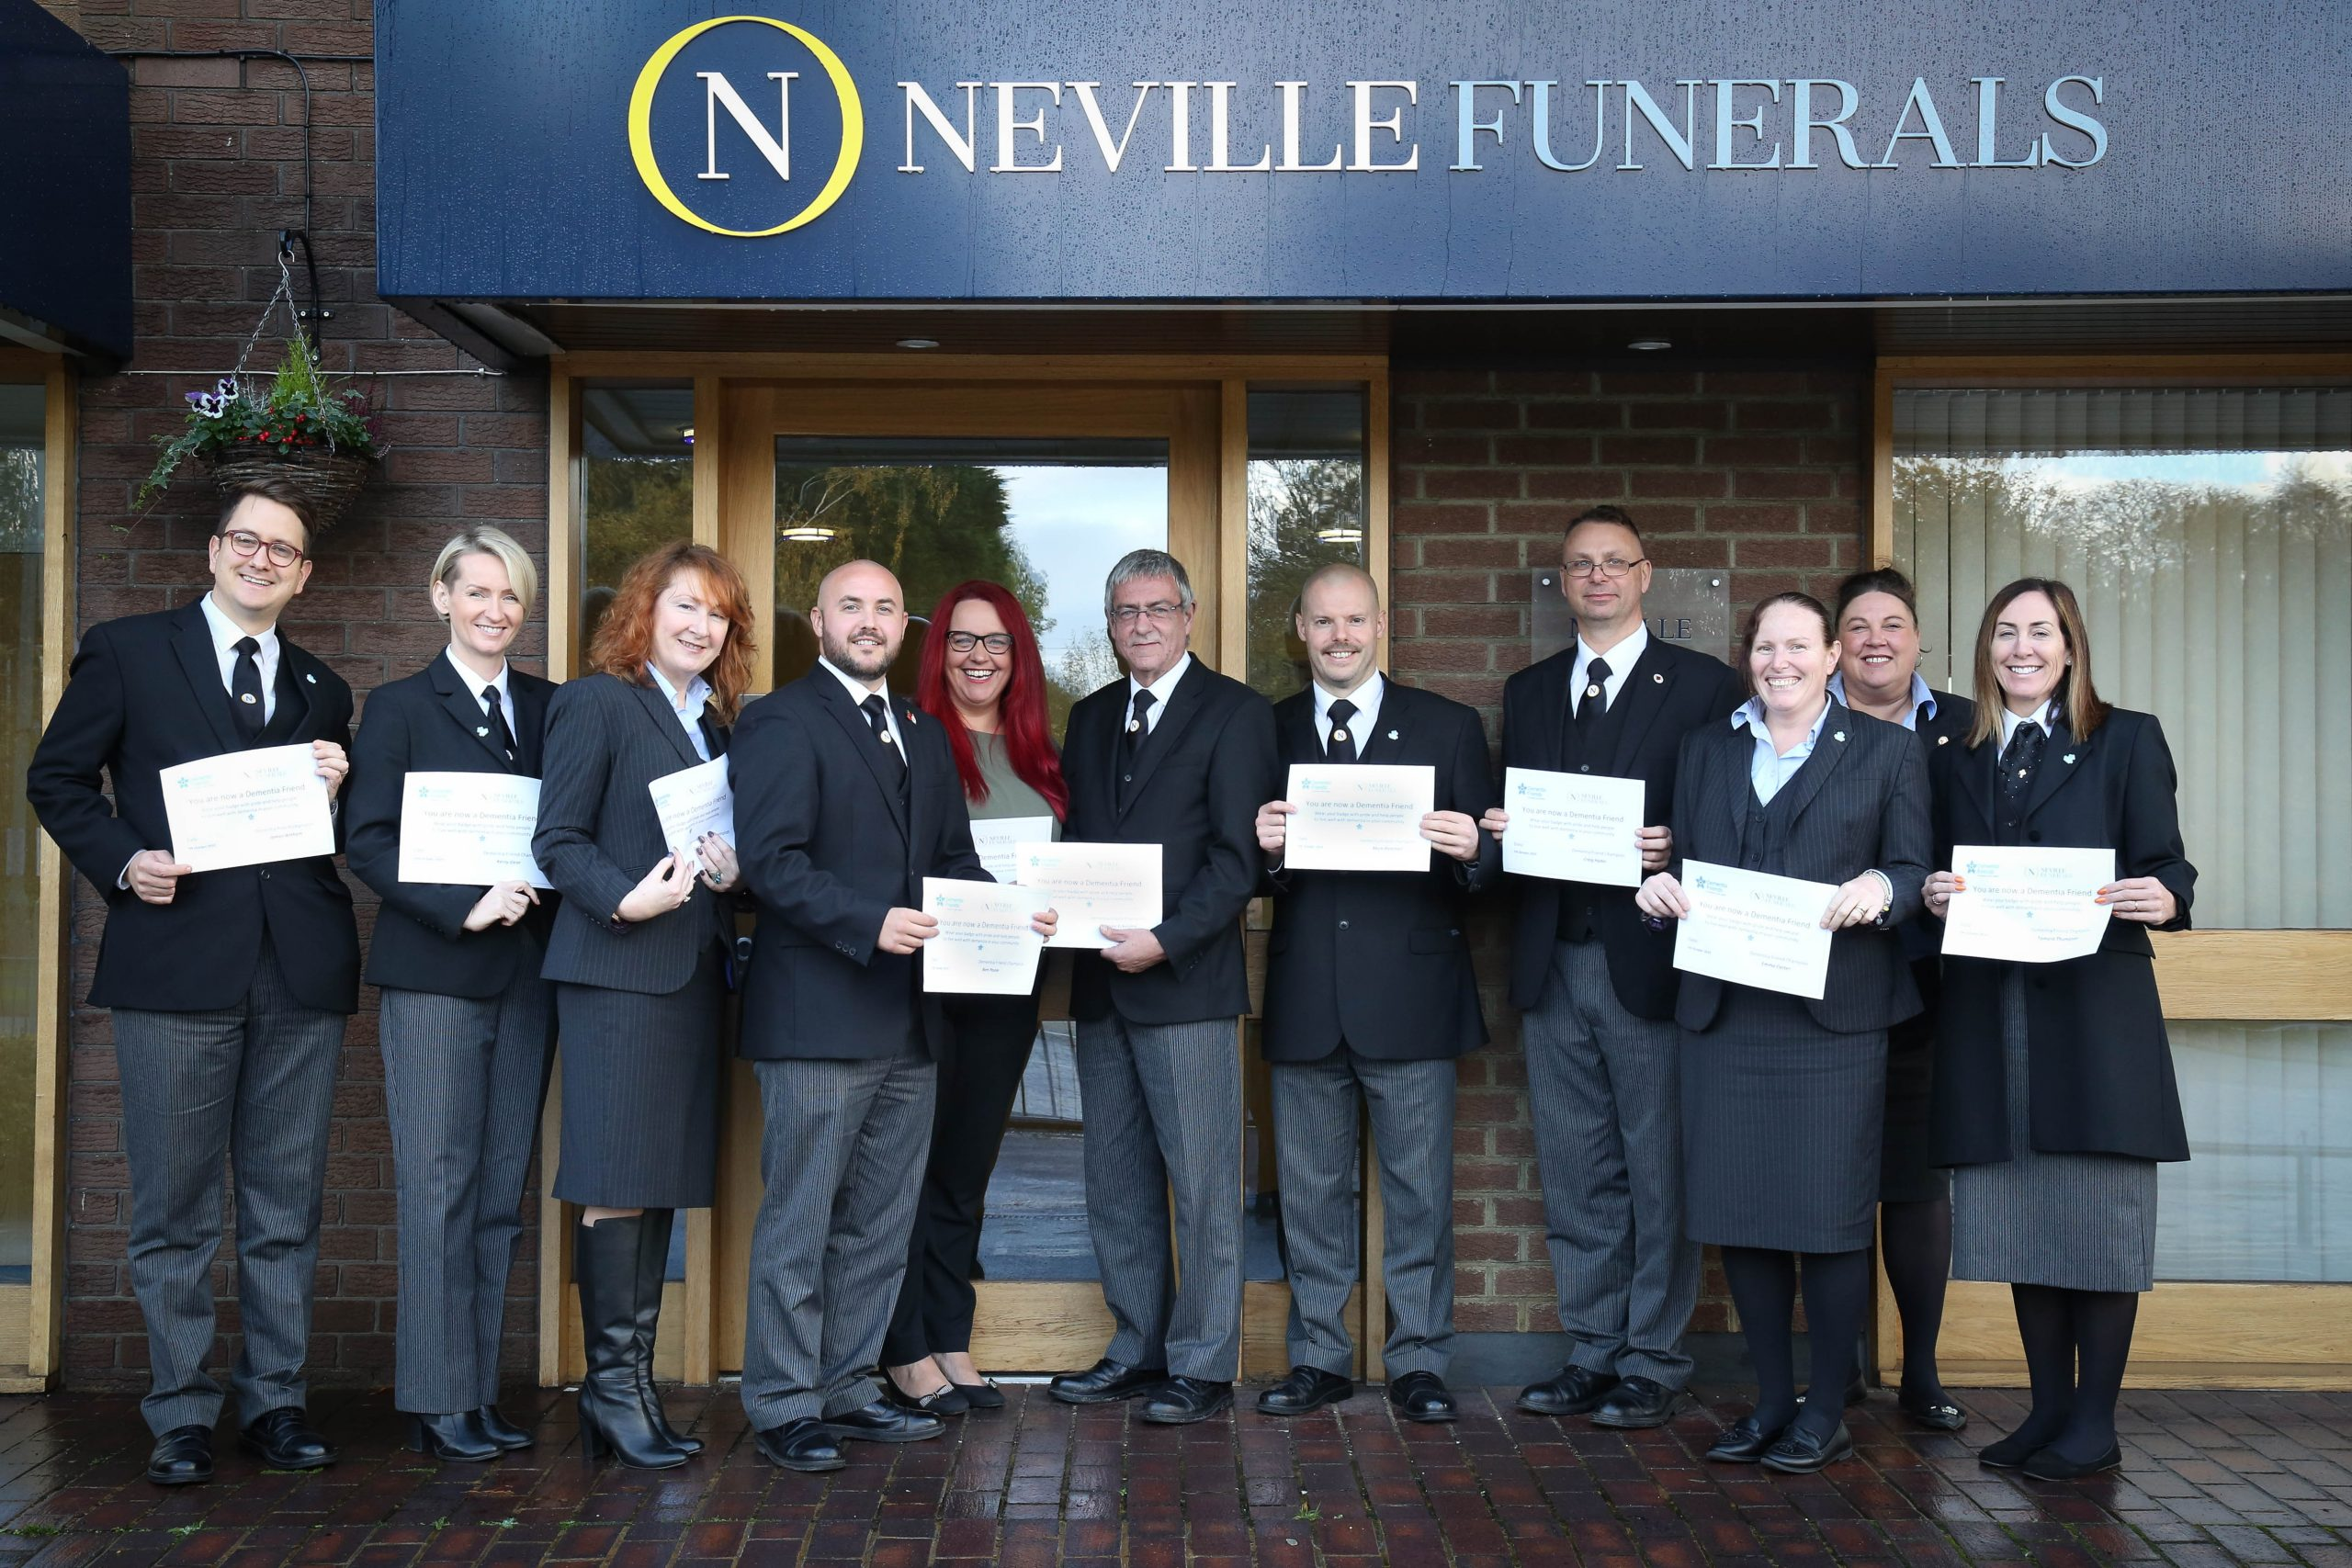 Dementia Friendly Funeral Directors